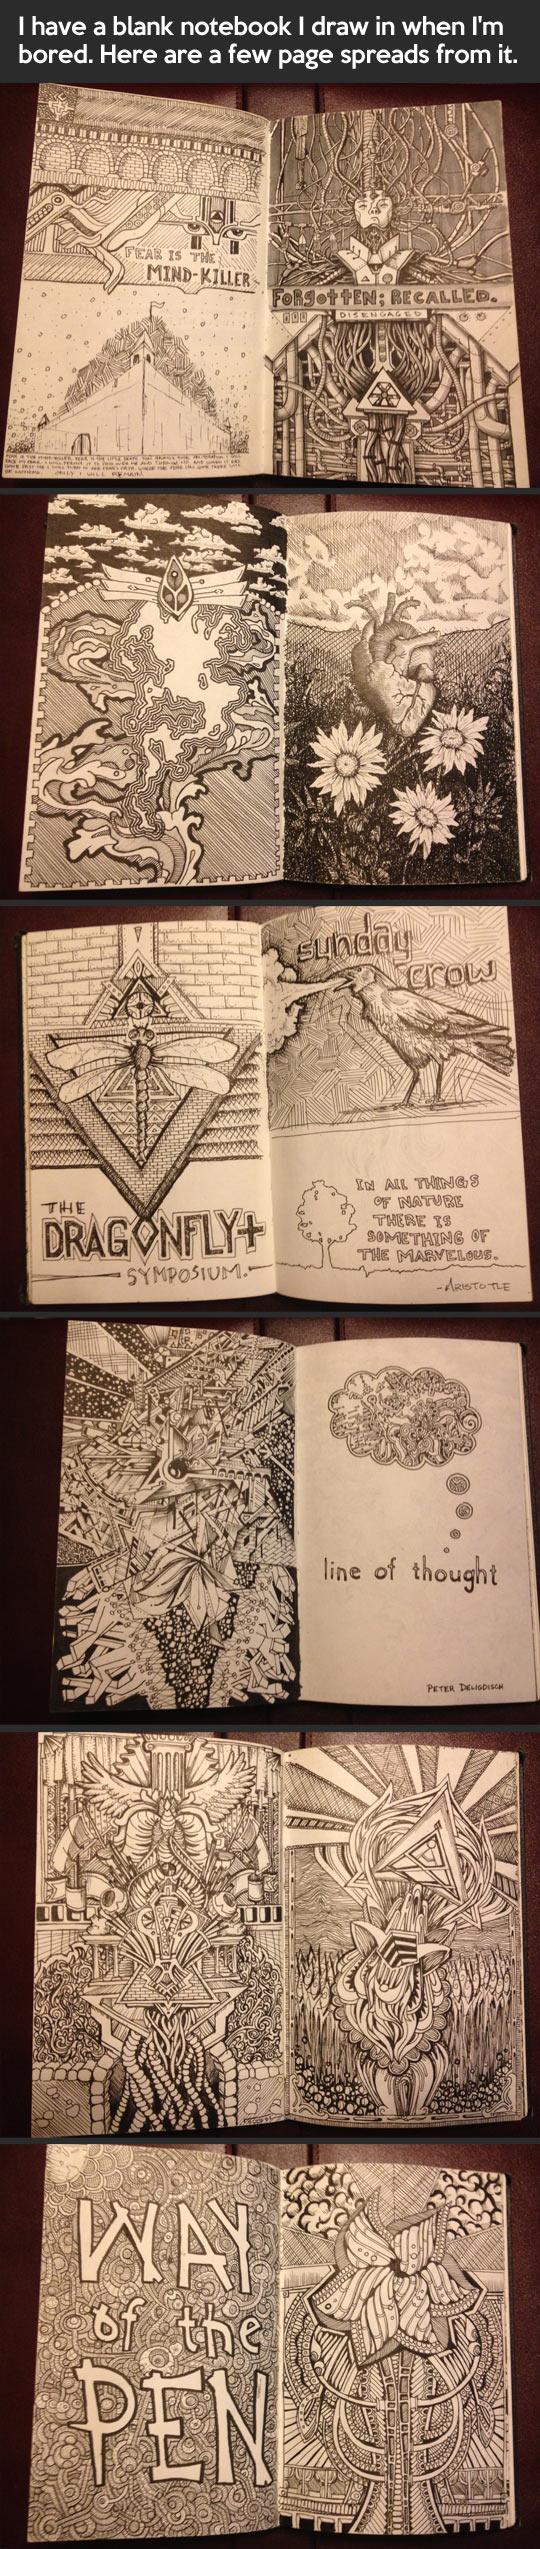 cool-drawings-Sharpie-notebook